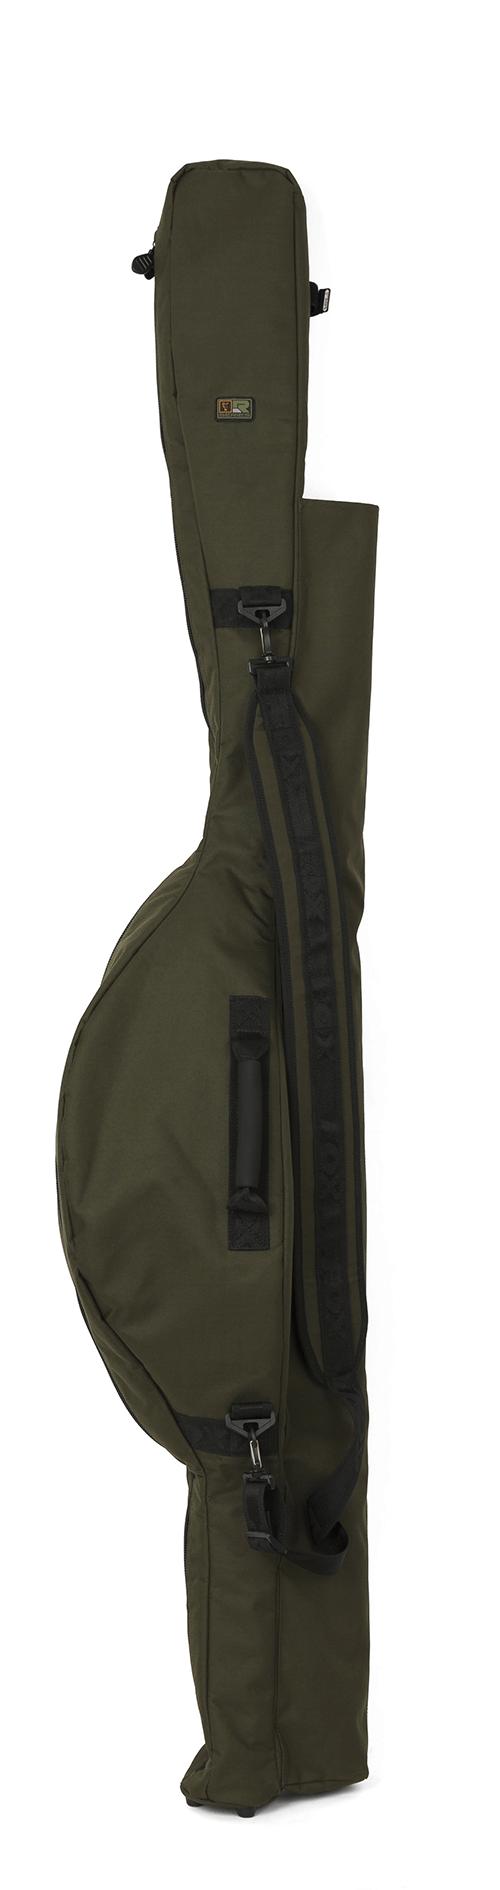 Fox R-Series 12ft. 2 Rod Sleeve 4